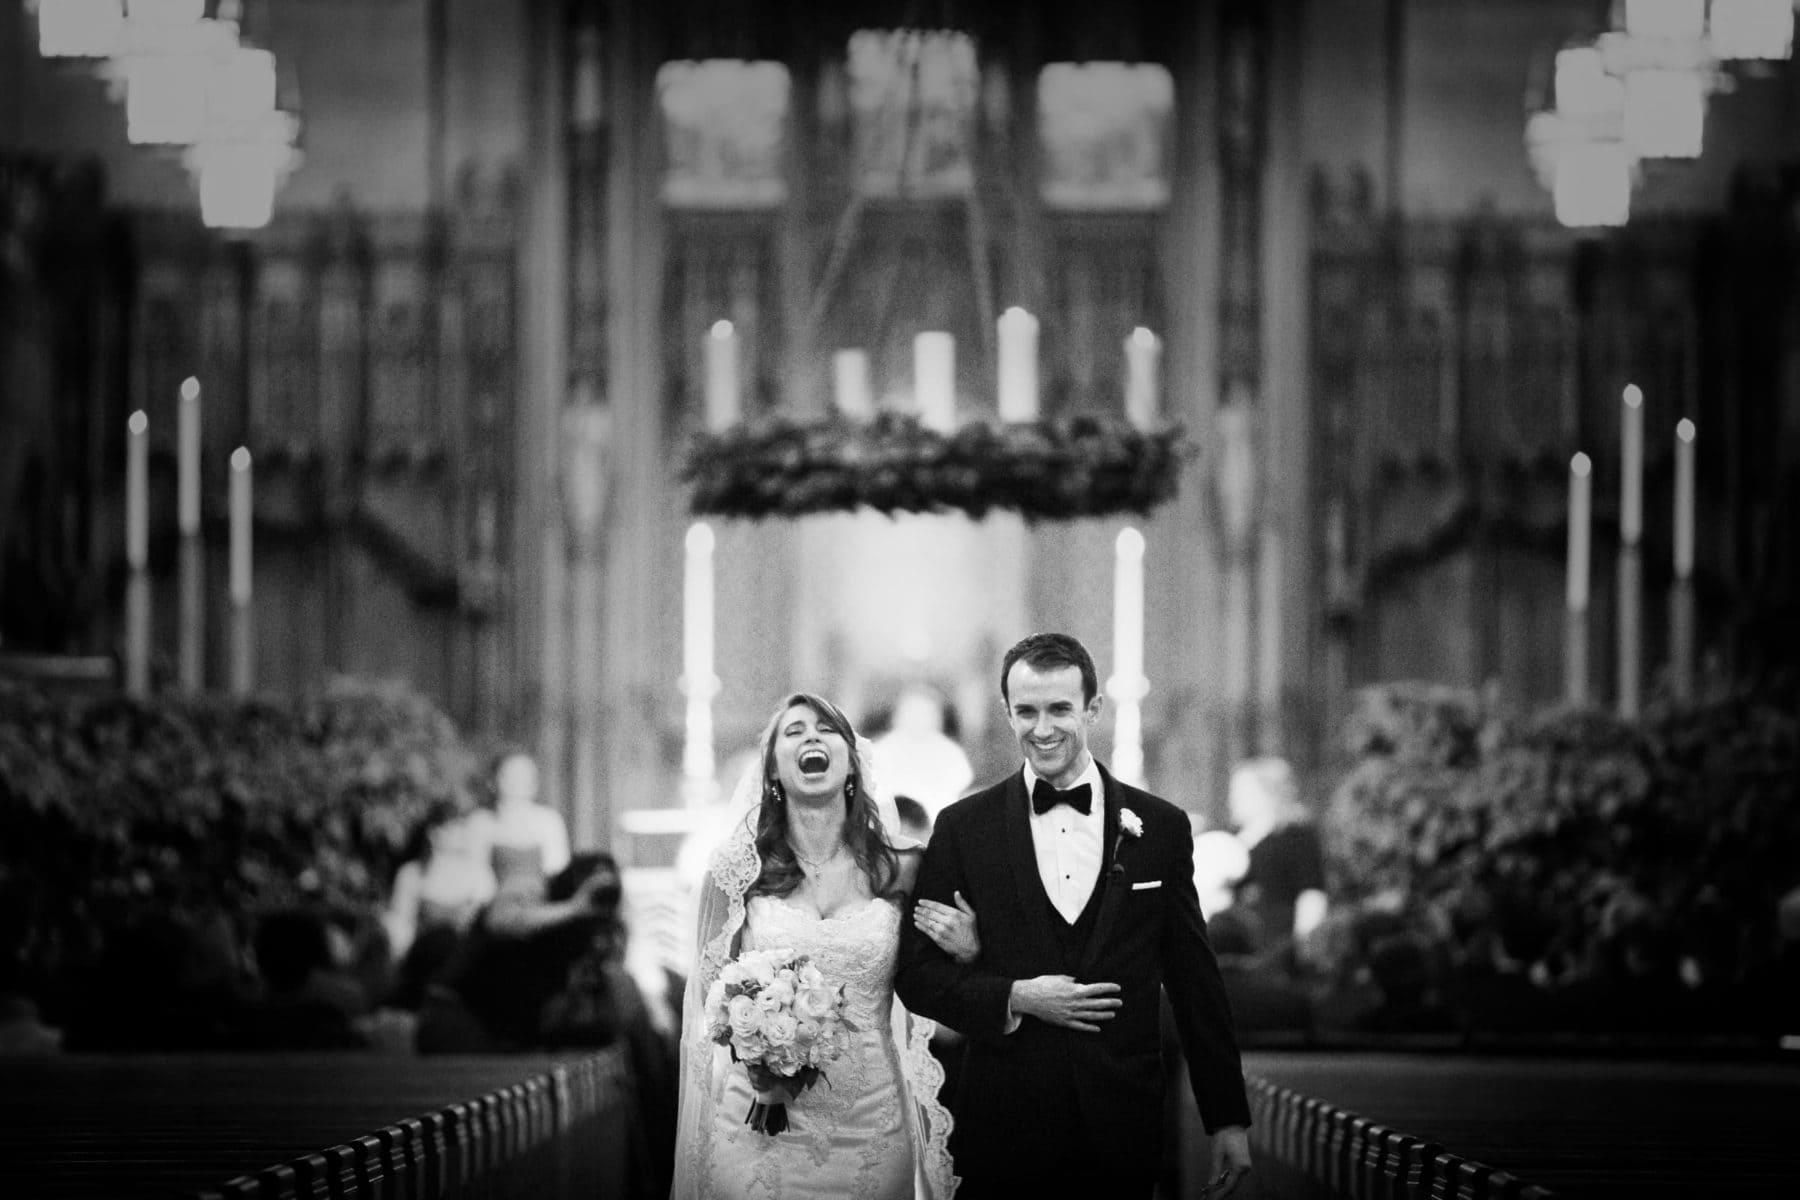 duke chapel bride groom recessional laughing bw 1